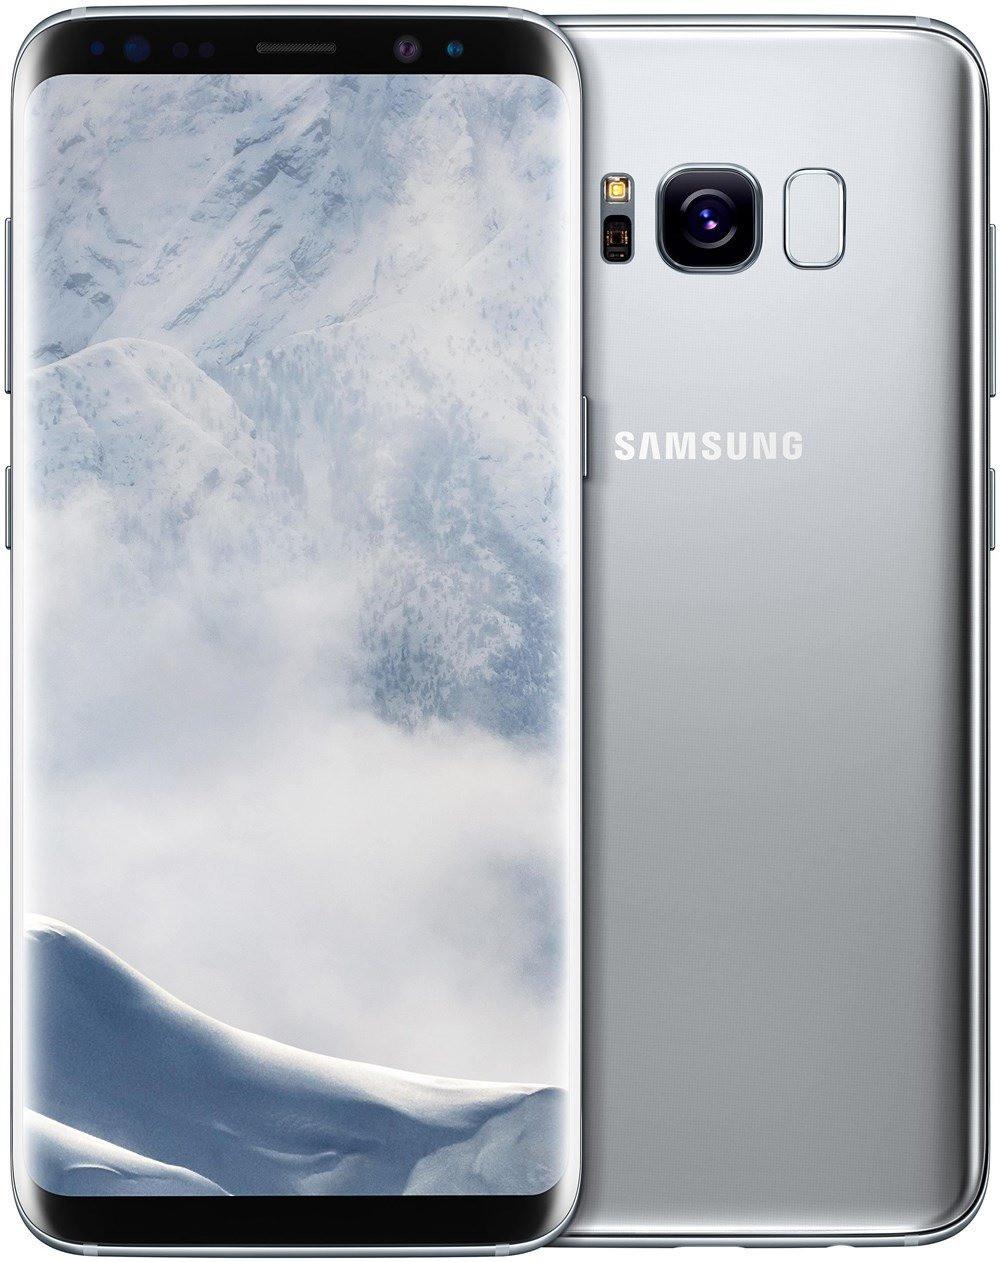 "Smartphone 5.8"" Samsung Galaxy S8 - WQHD+, Exynos 8895, 4 Go de RAM, 64 Go, argent (via 60€ en fidélité) - Saint-Nicolas-de-Redon (44)"